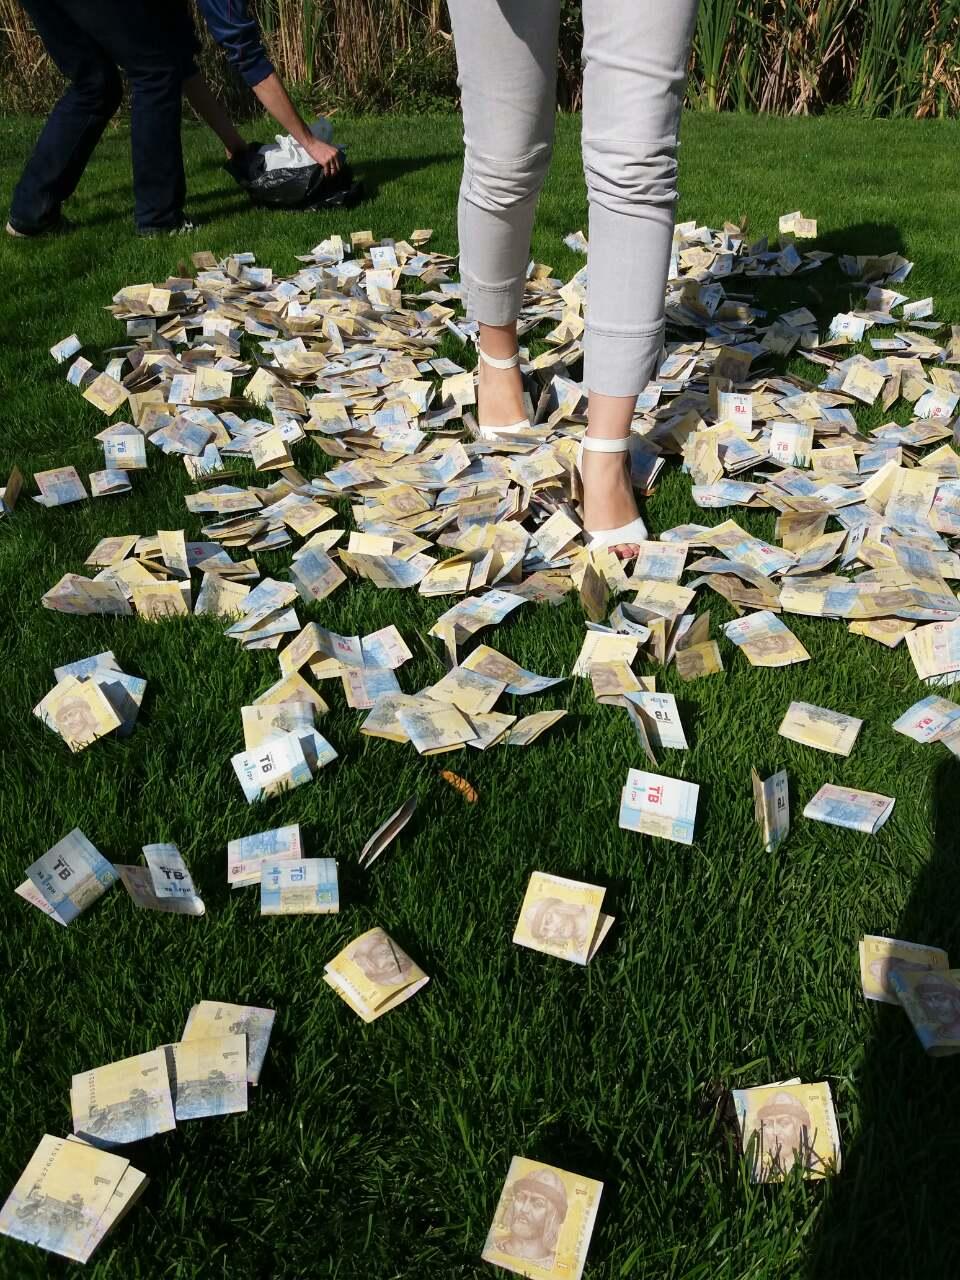 В рамках рекламной акции Фрегат разбросал с коптера 200 тыс. грн